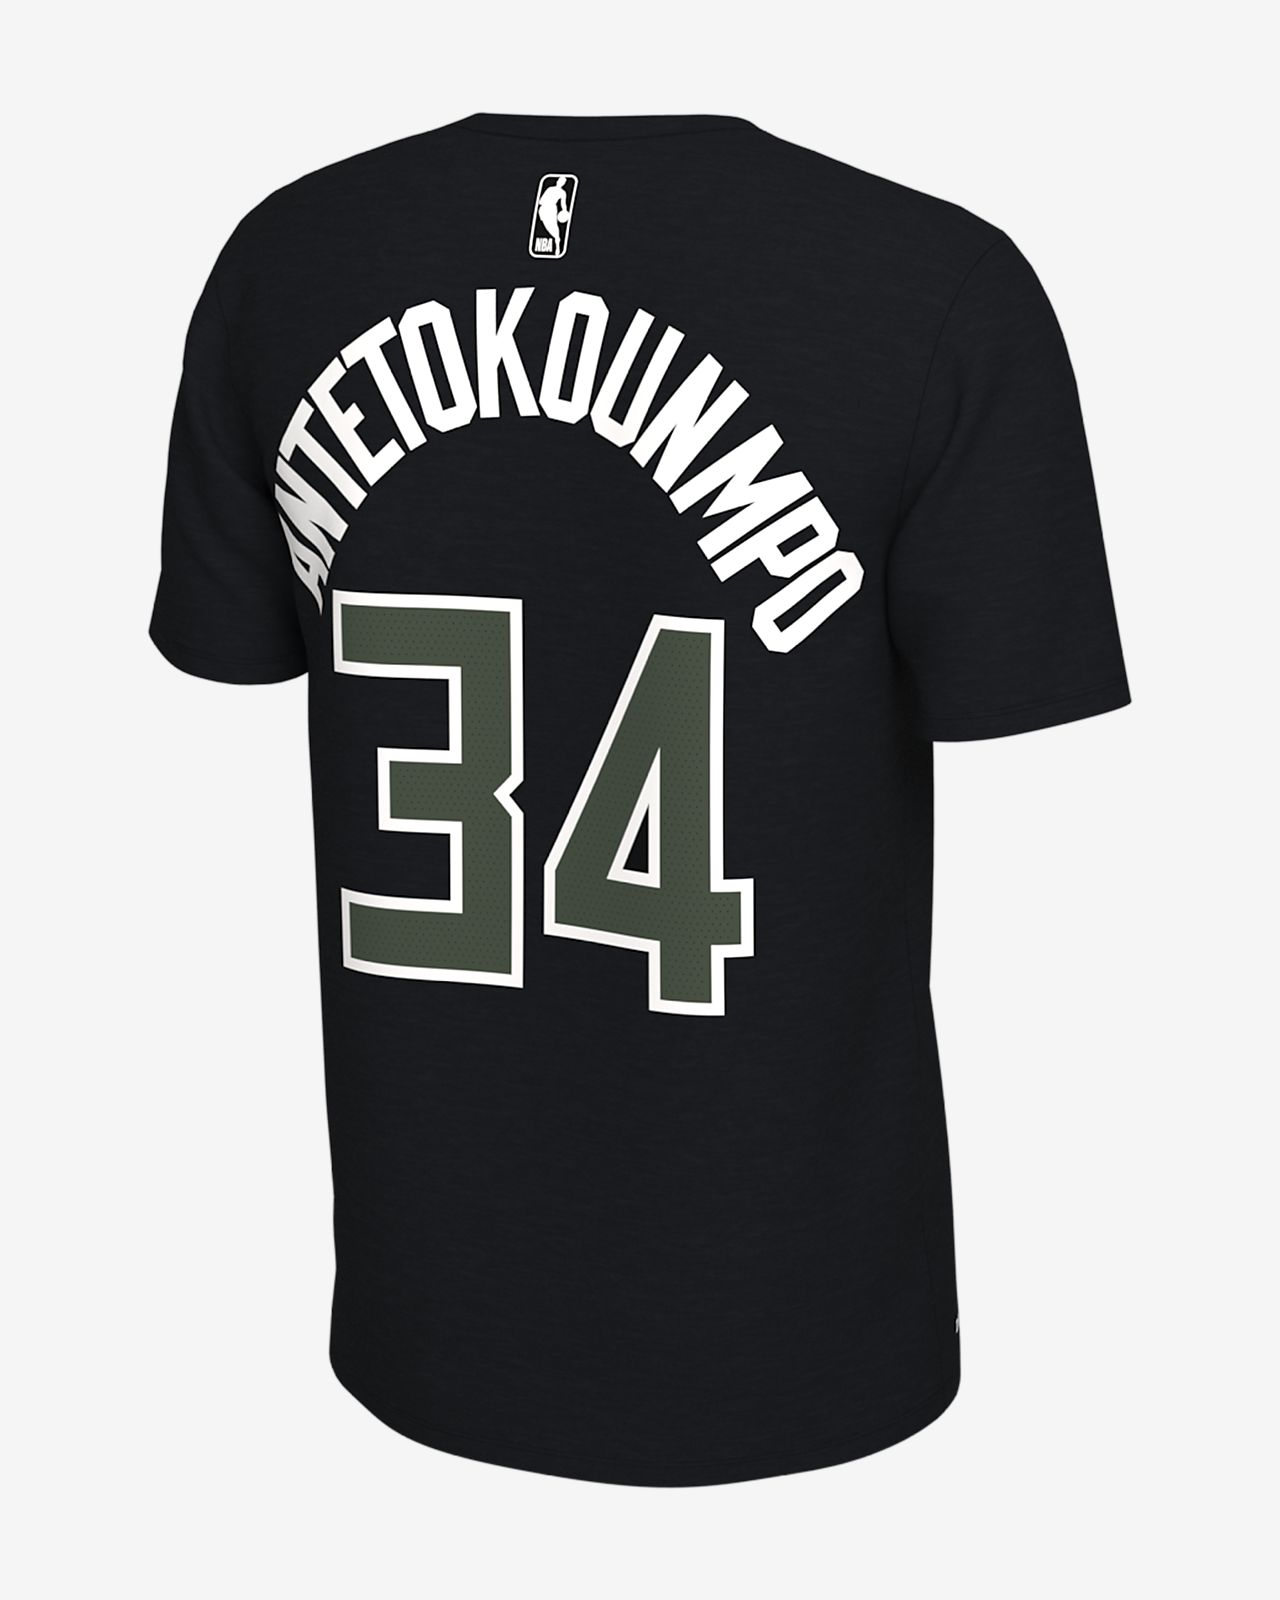 fd8afabbf09 Giannis Antetokounmpo Milwaukee Bucks Nike Dri-FIT Men s NBA T-Shirt ...